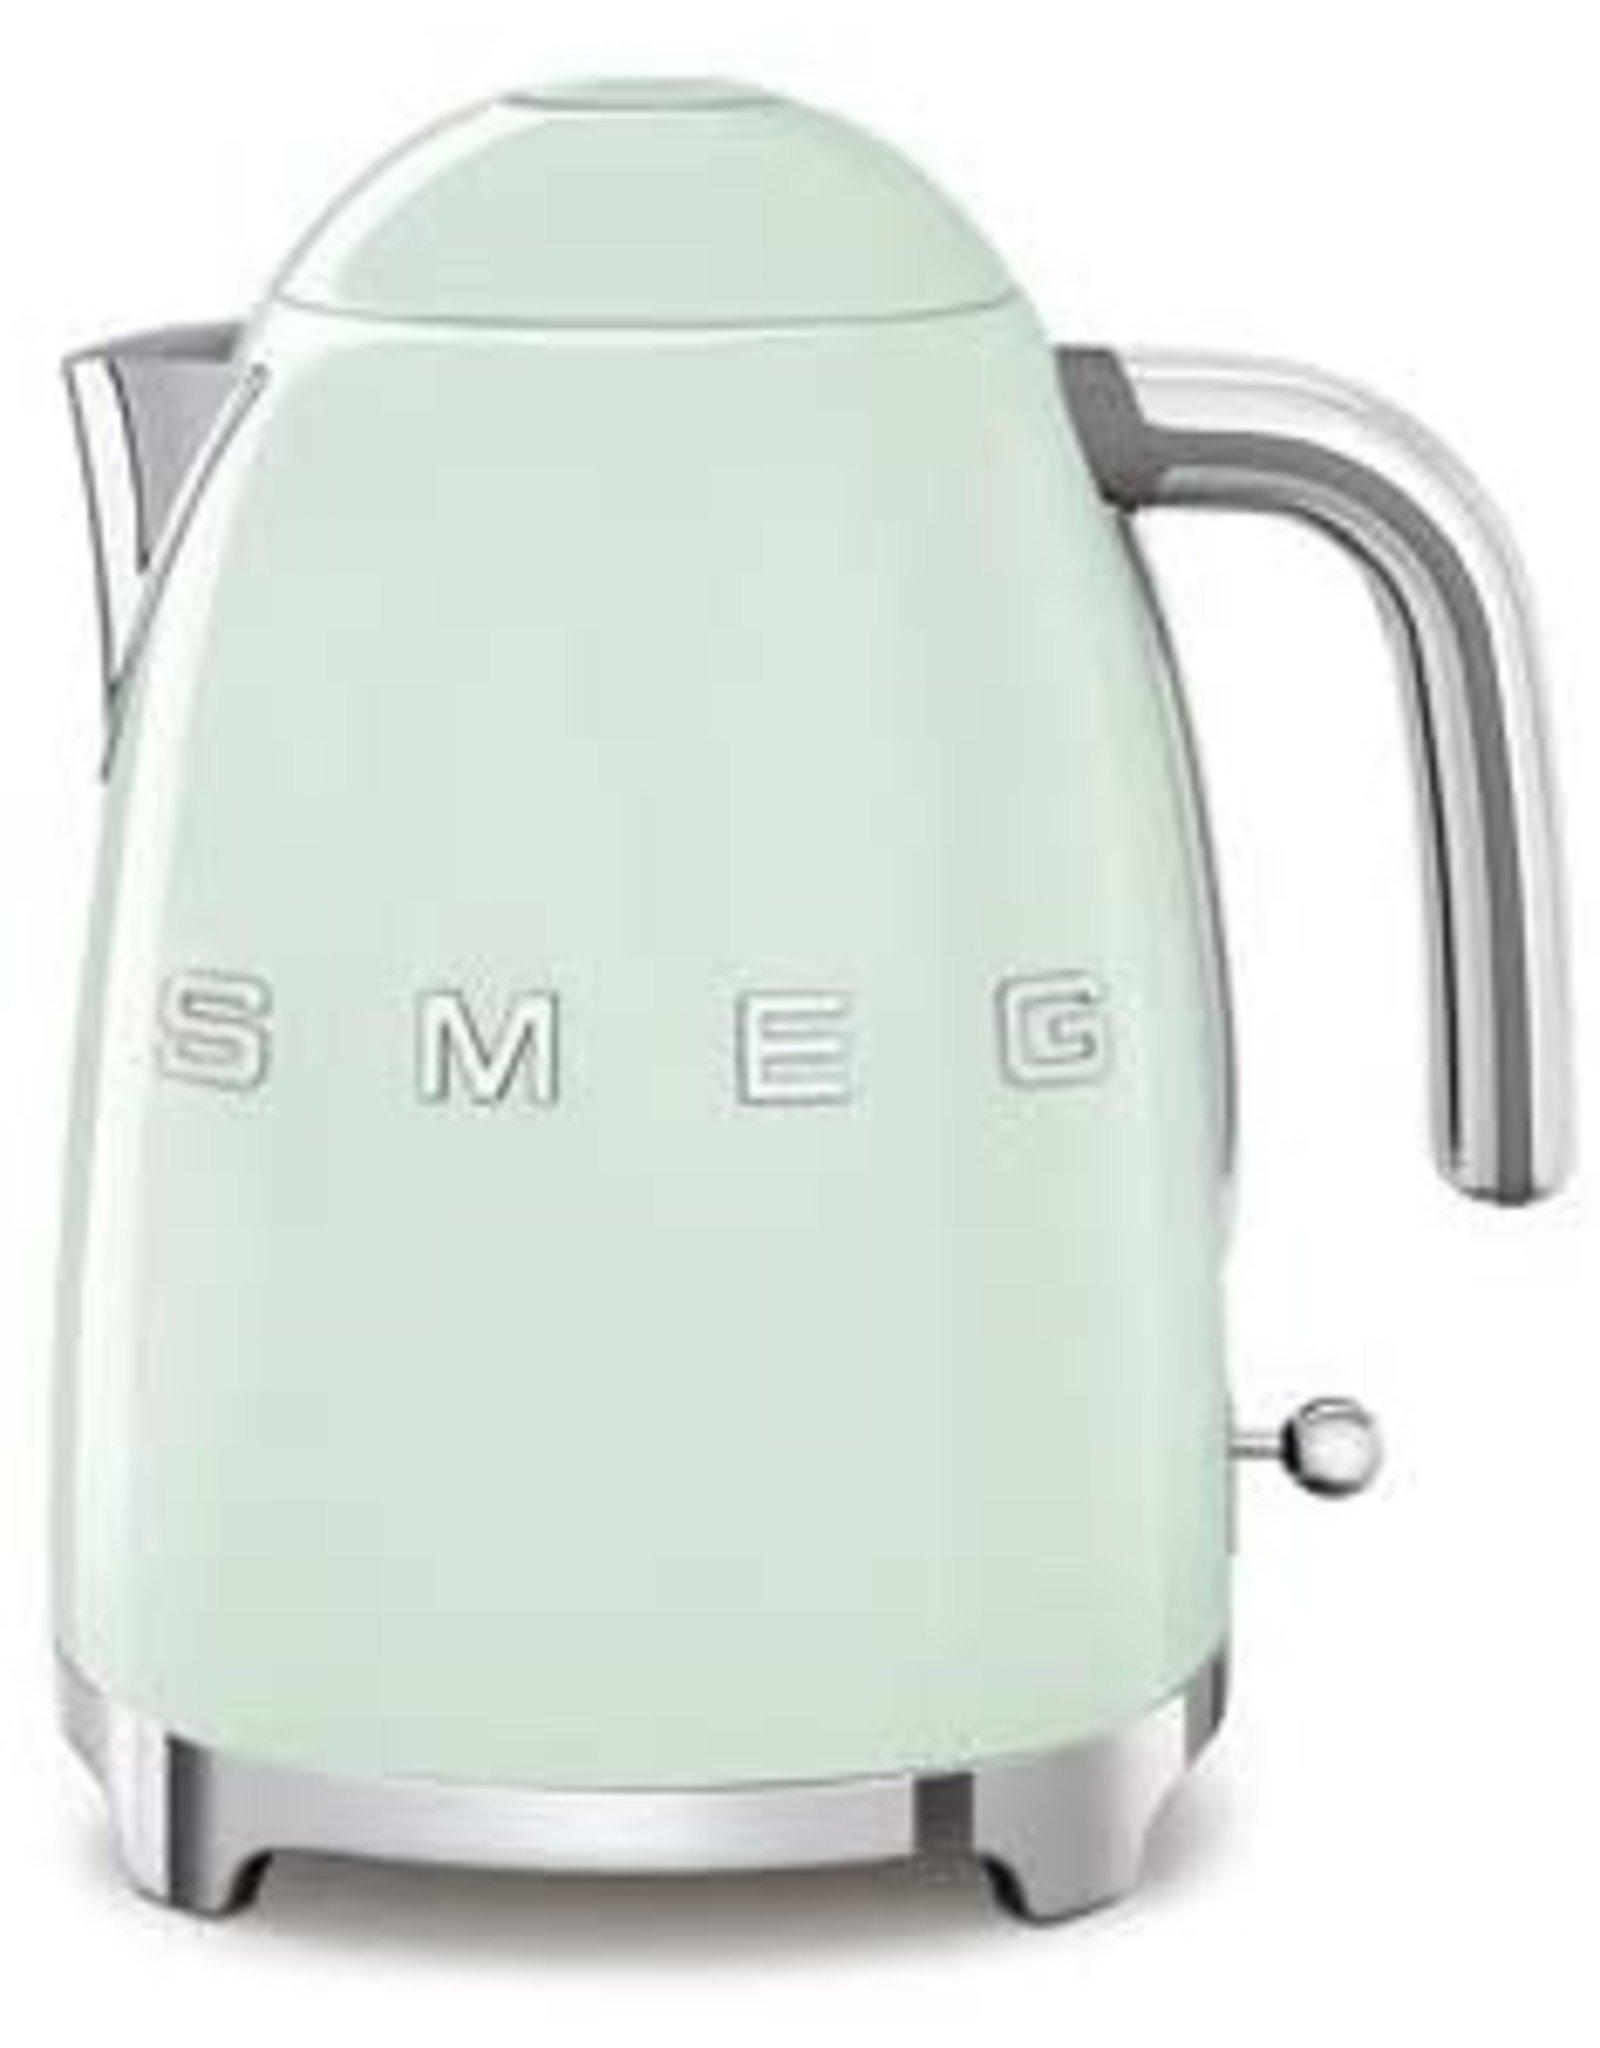 Smeg SMEG - Electric Kettle - Green